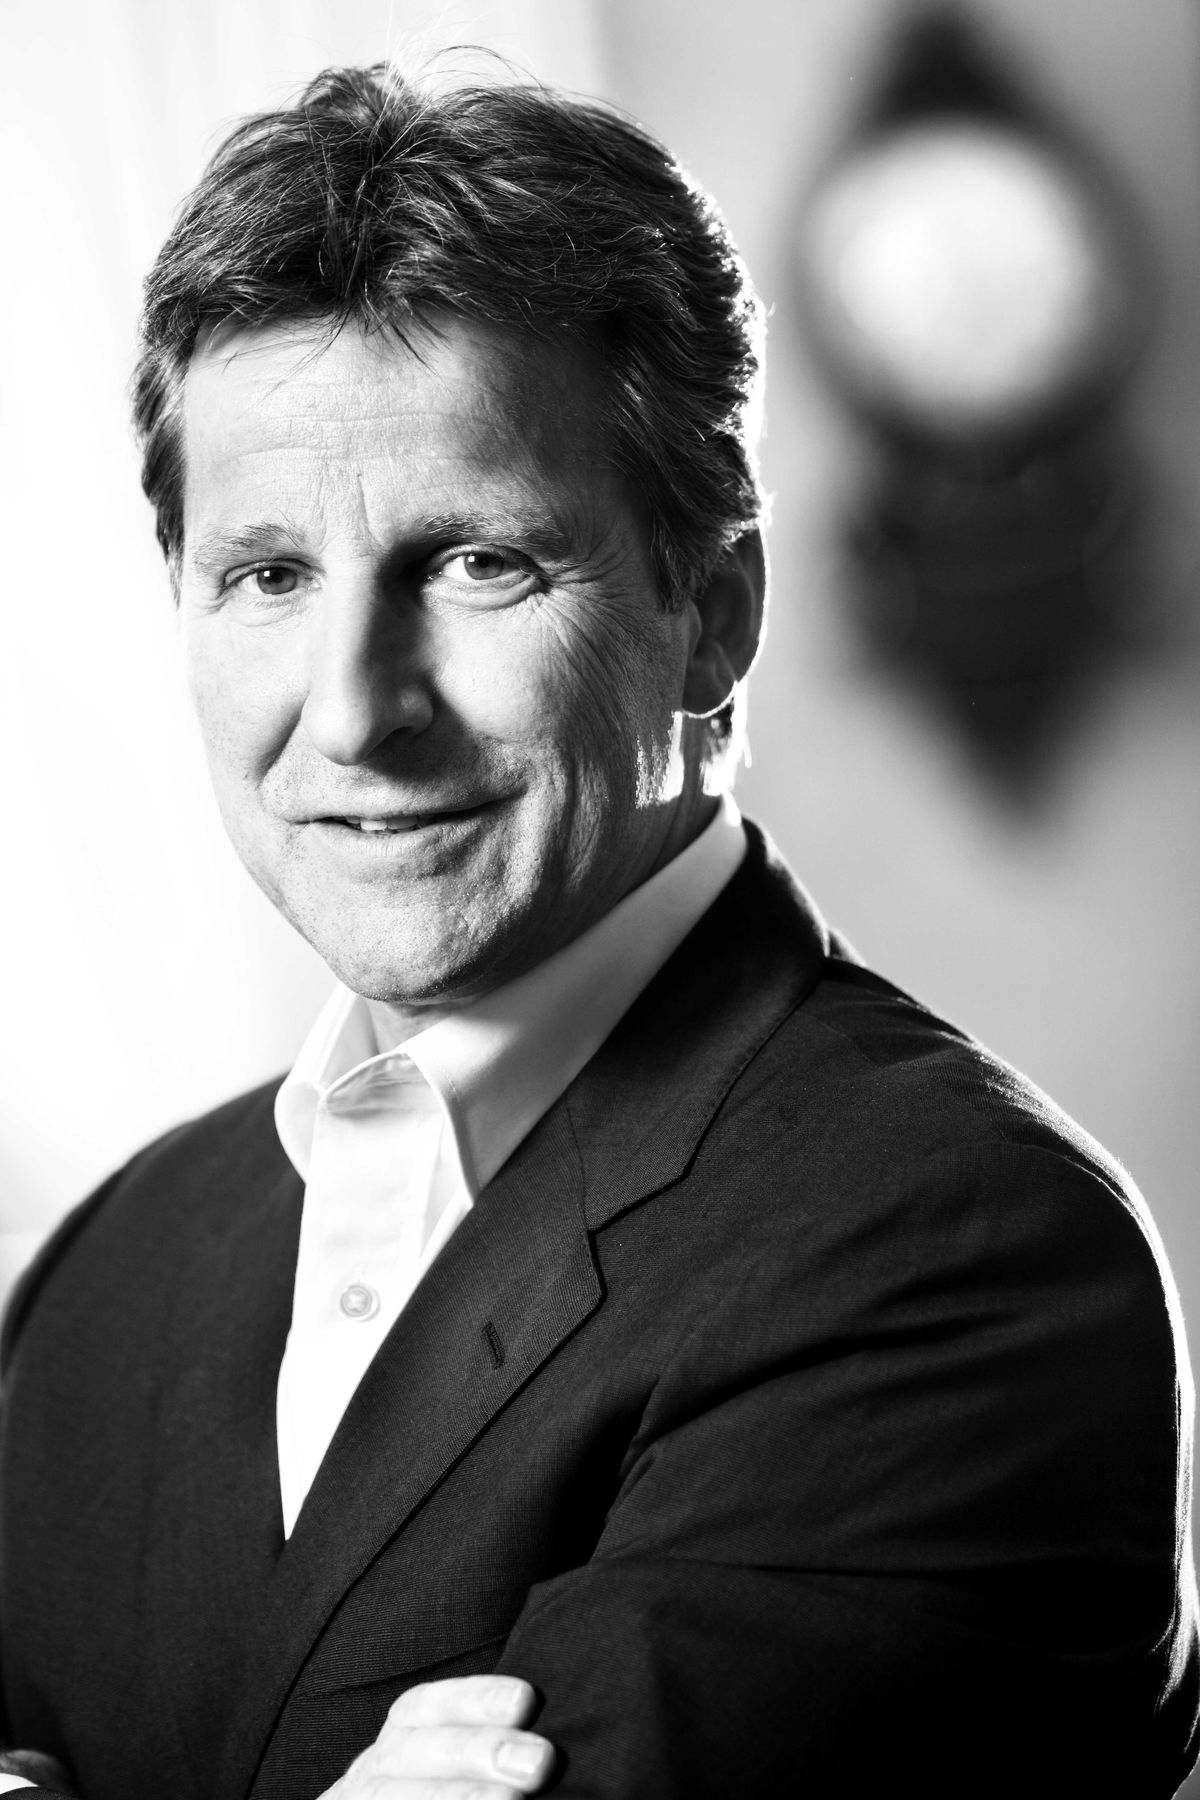 Michael Parmigiani